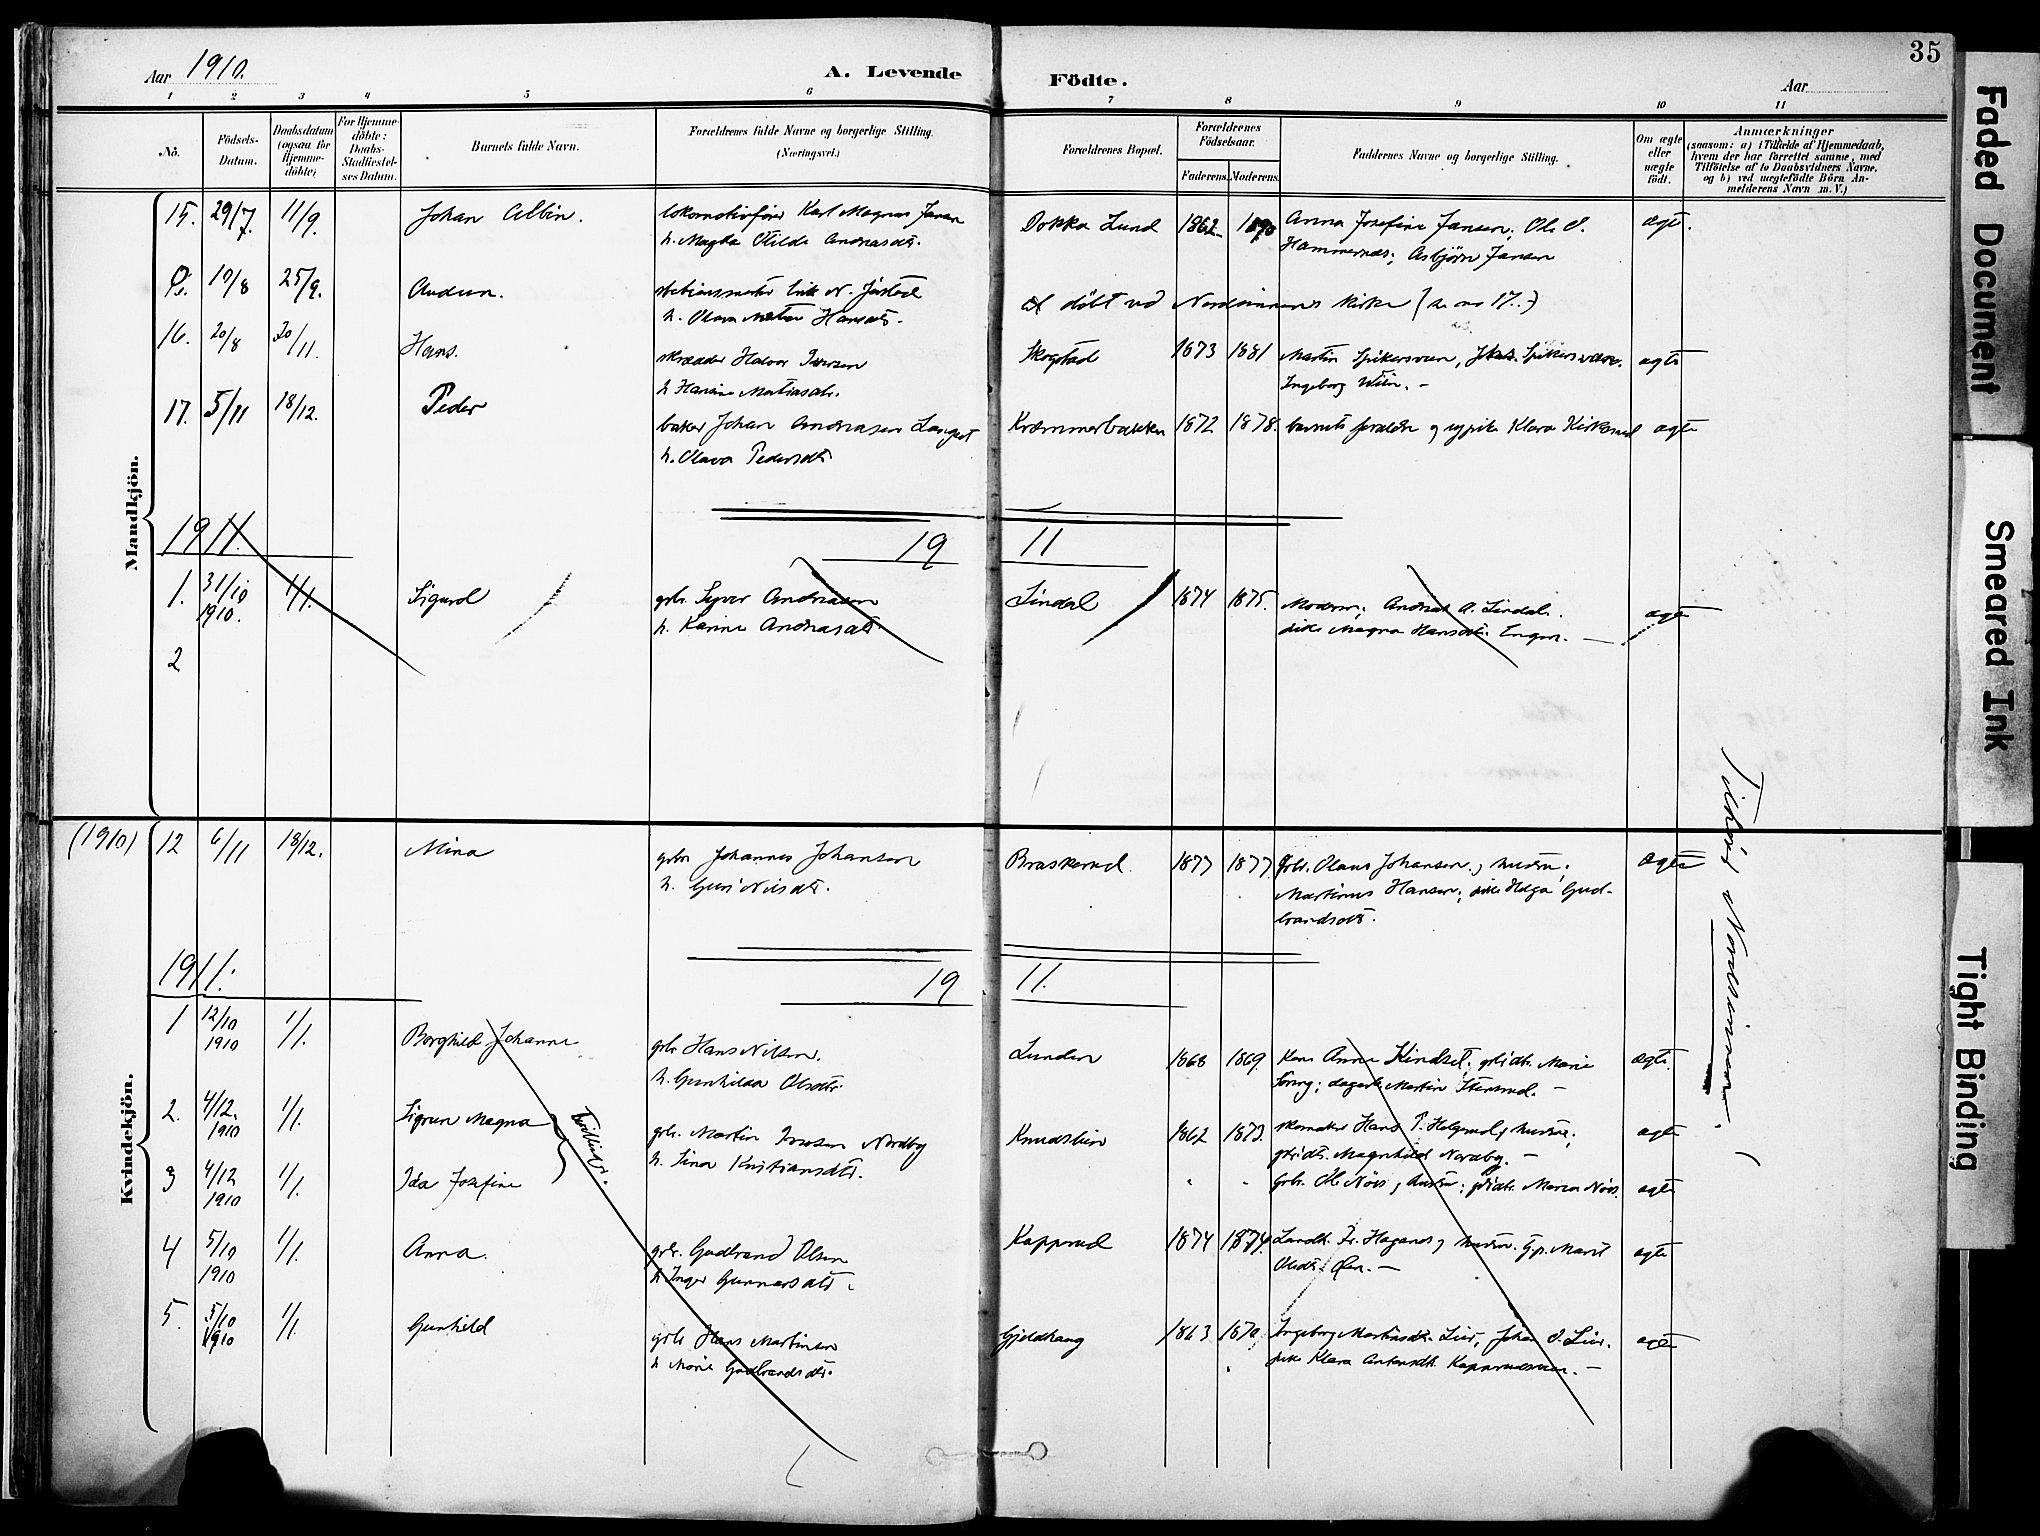 SAH, Nordre Land prestekontor, Ministerialbok nr. 6, 1897-1914, s. 35